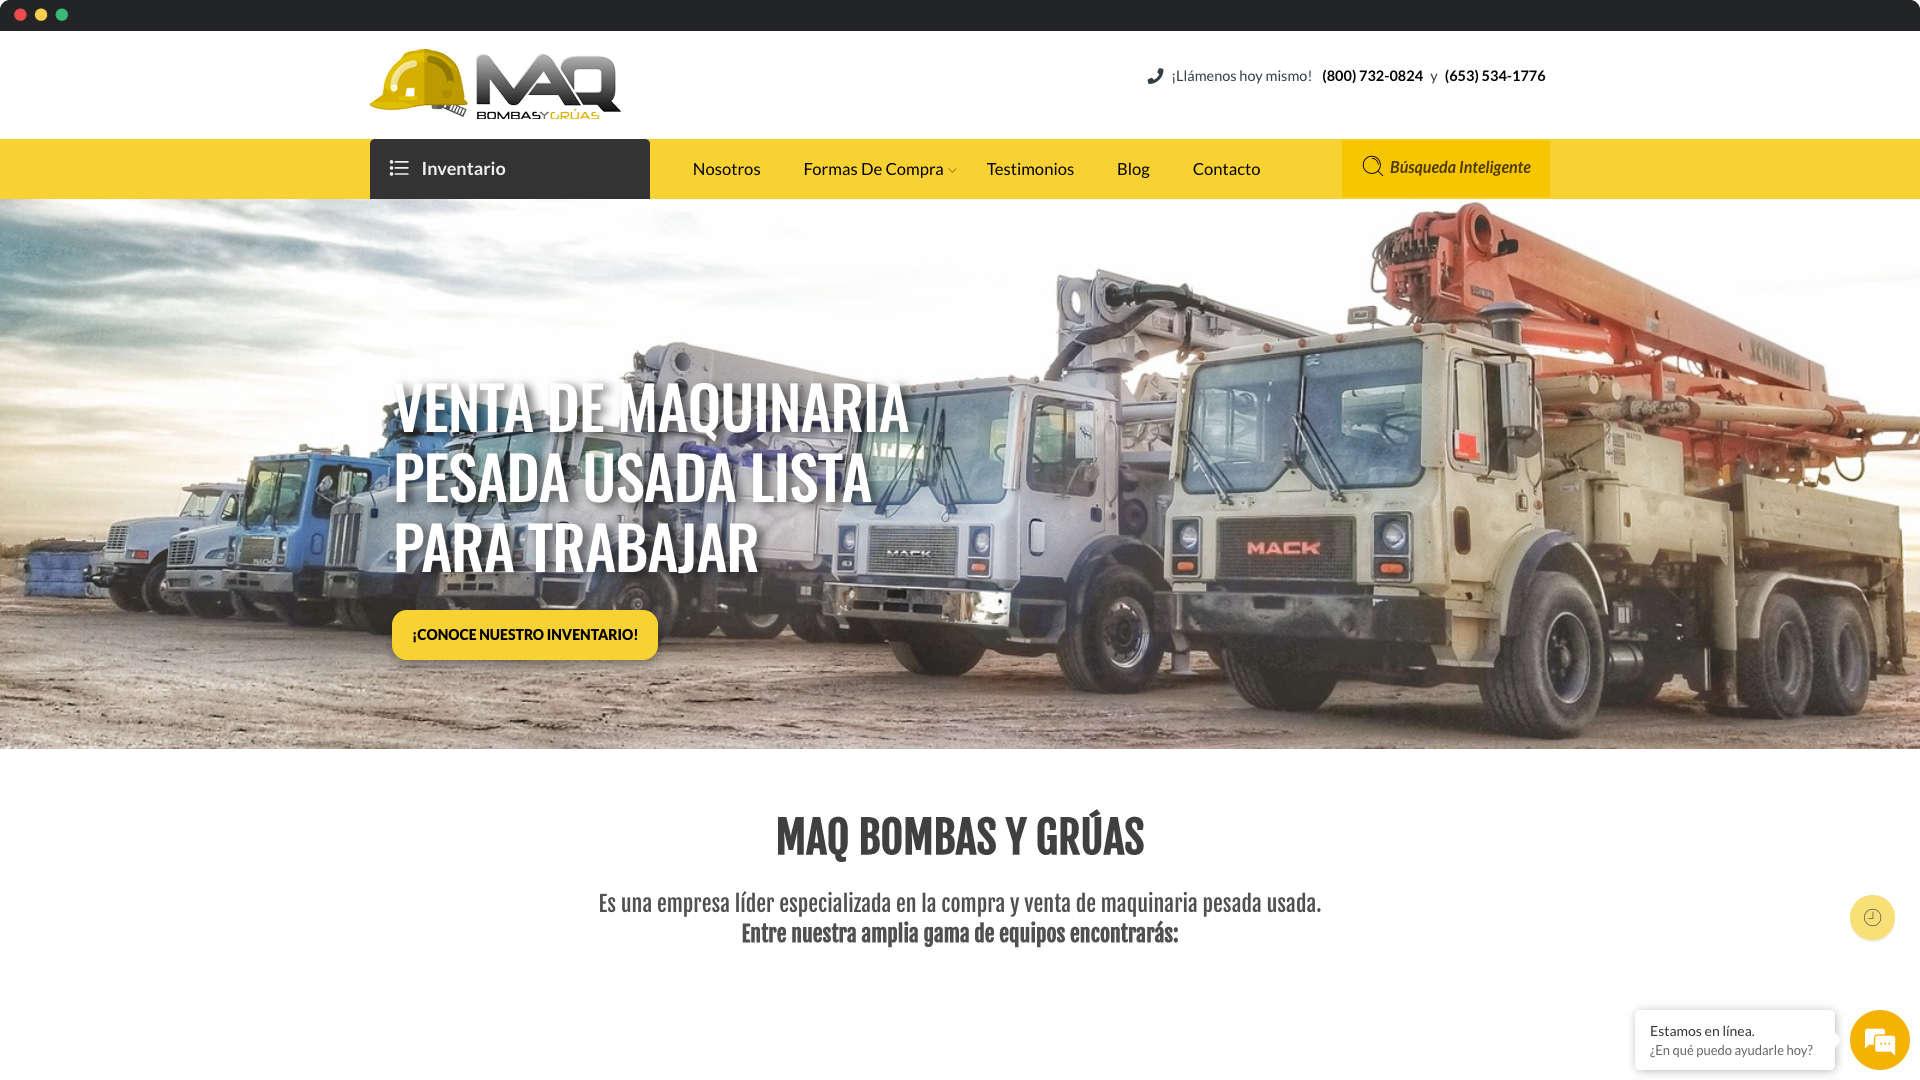 captura de pantalla de sitio web de MAQ Bombas y Grúas